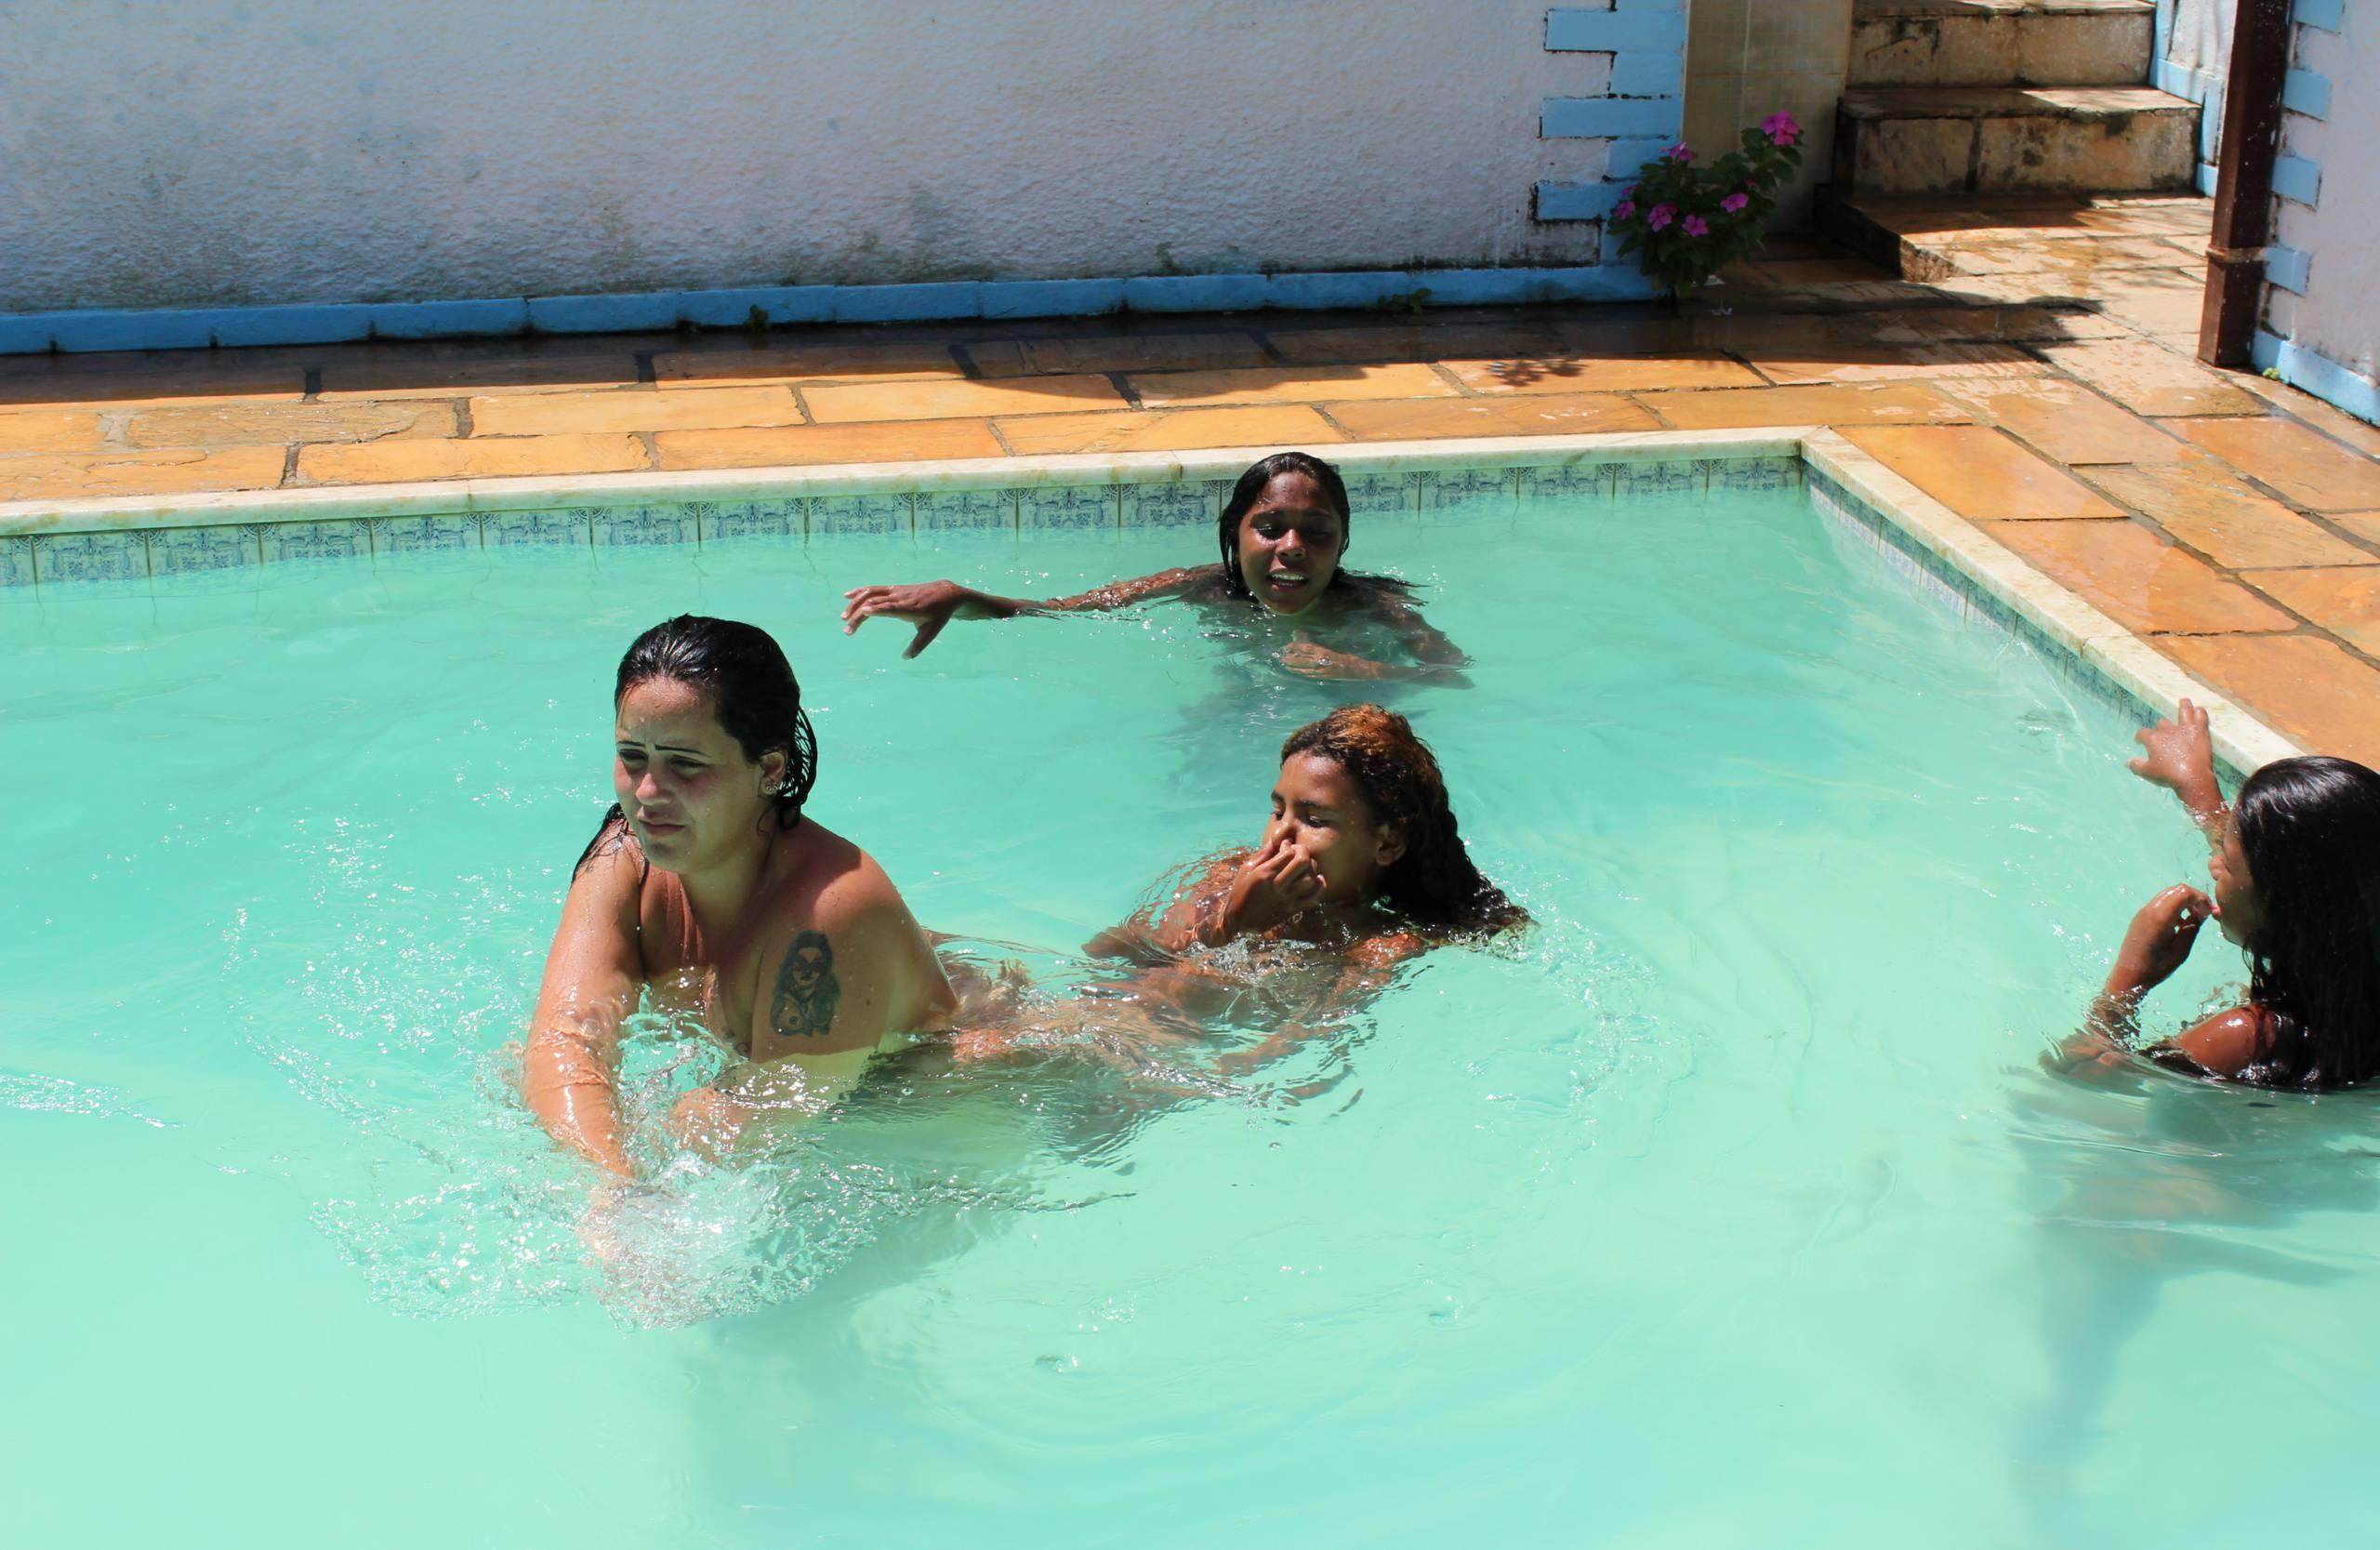 Brazil Pool Sunbath - 1